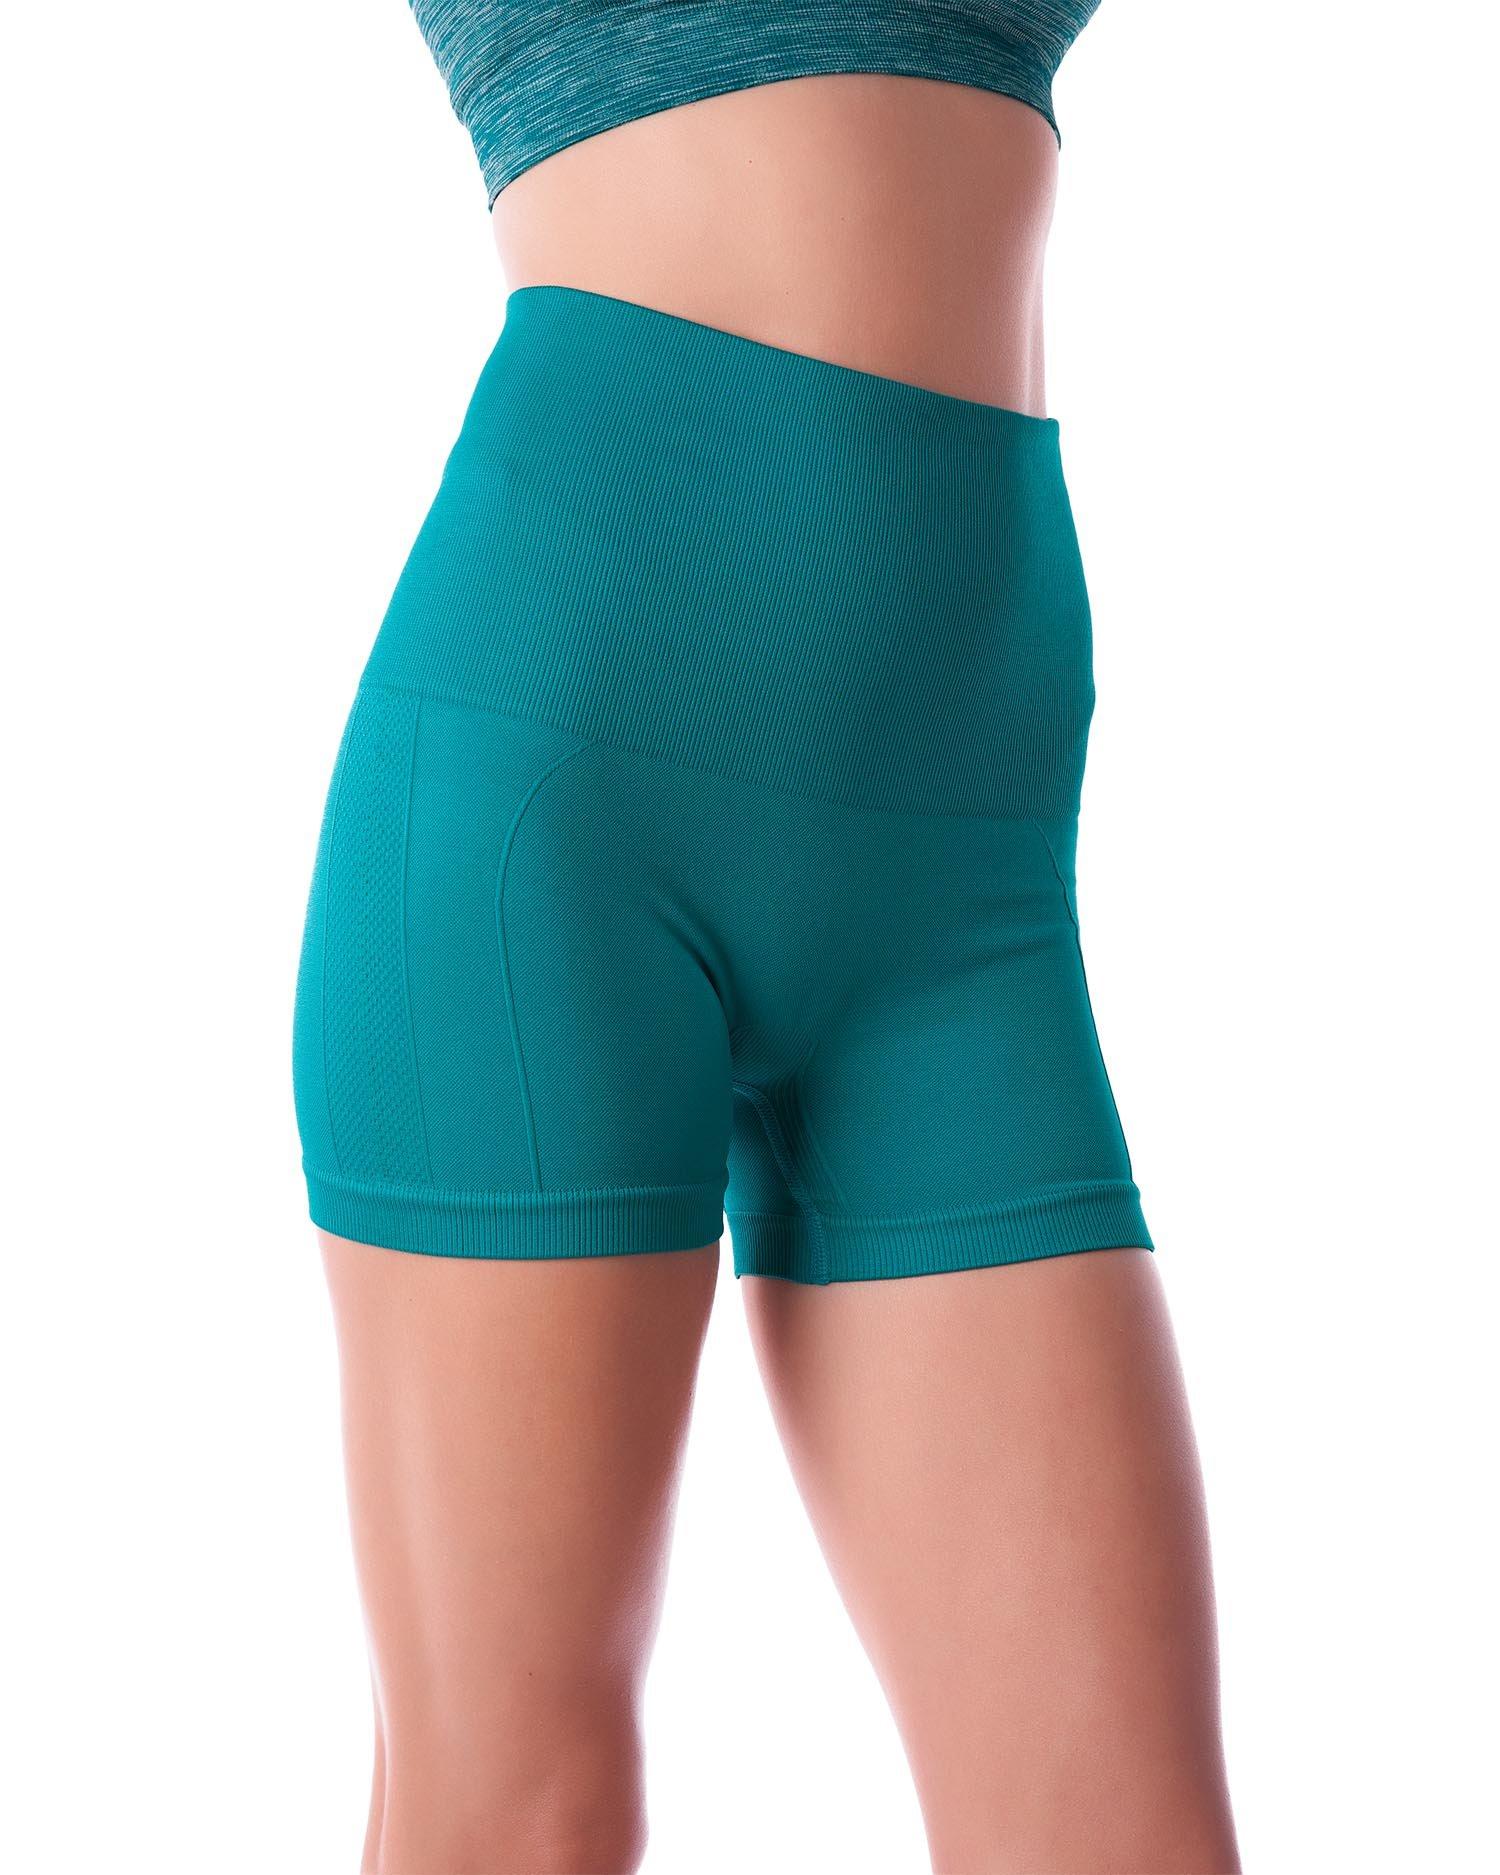 Homma Women's Tummy Control Fitness Workout Running Bike Shorts Yoga Shorts ... (Large, Jade 2) by Homma